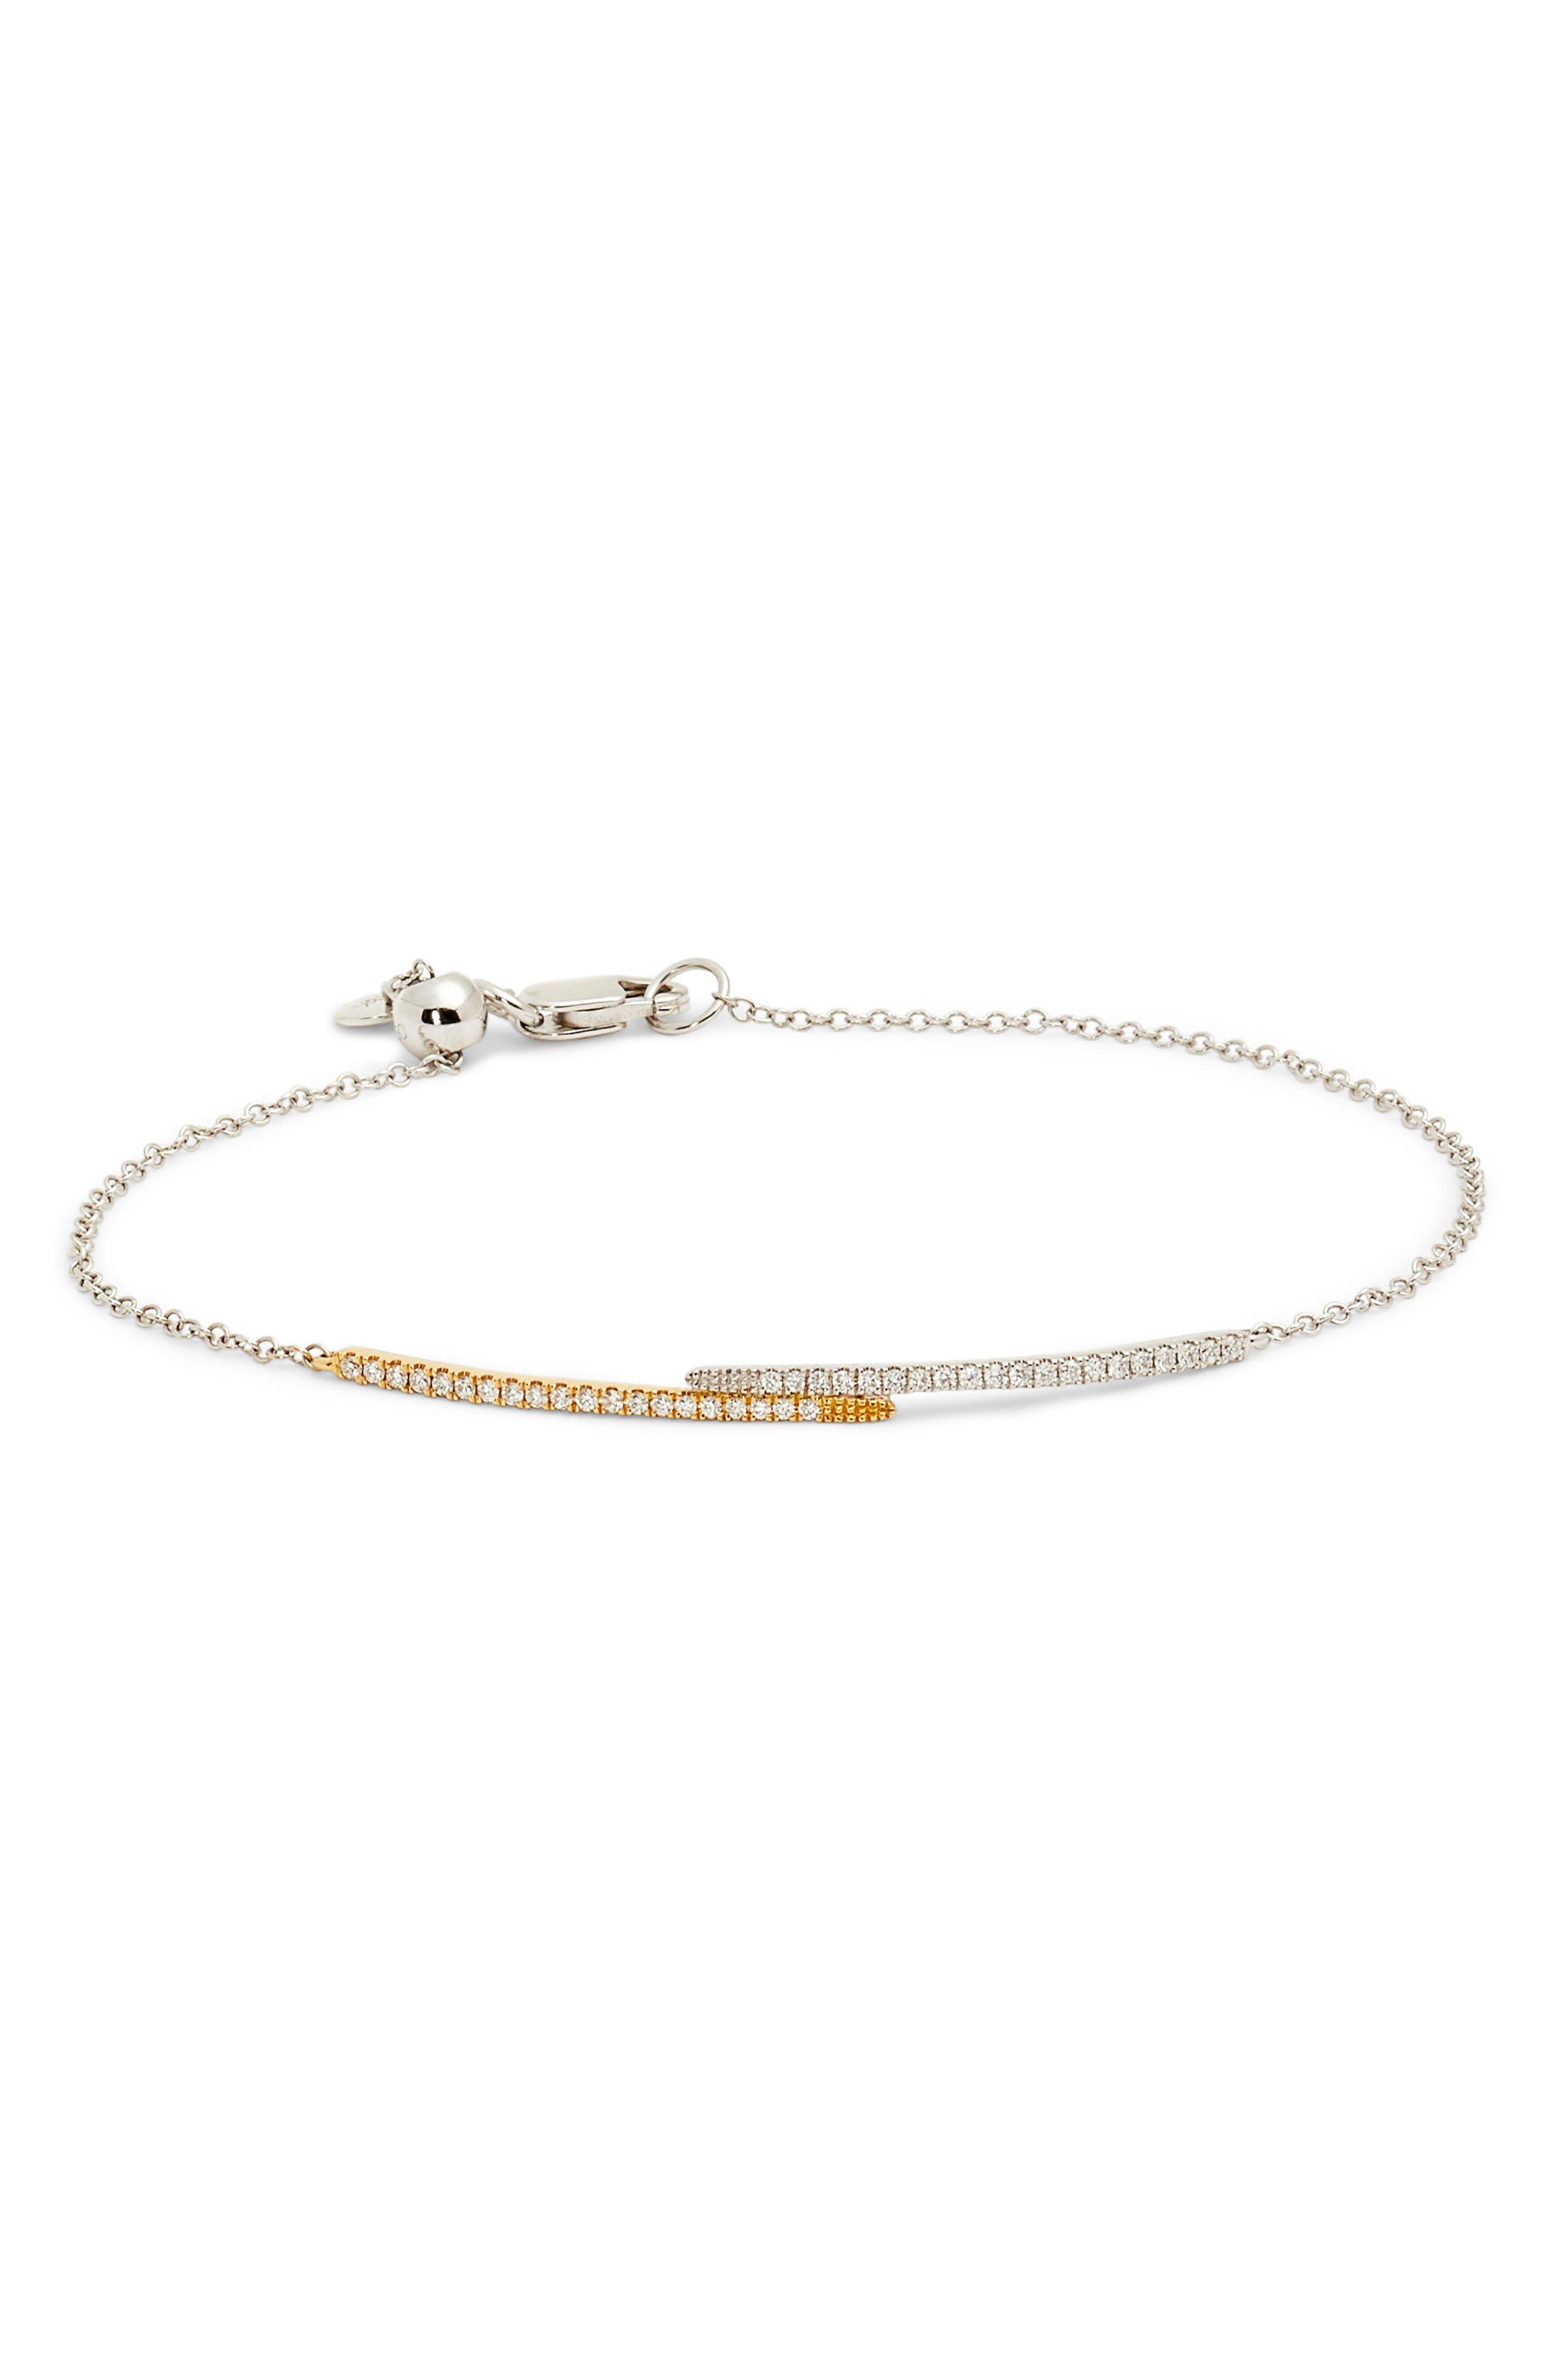 Two-Tone Adjustable Diamond Bar Bracelet,                             Main thumbnail 1, color,                             040